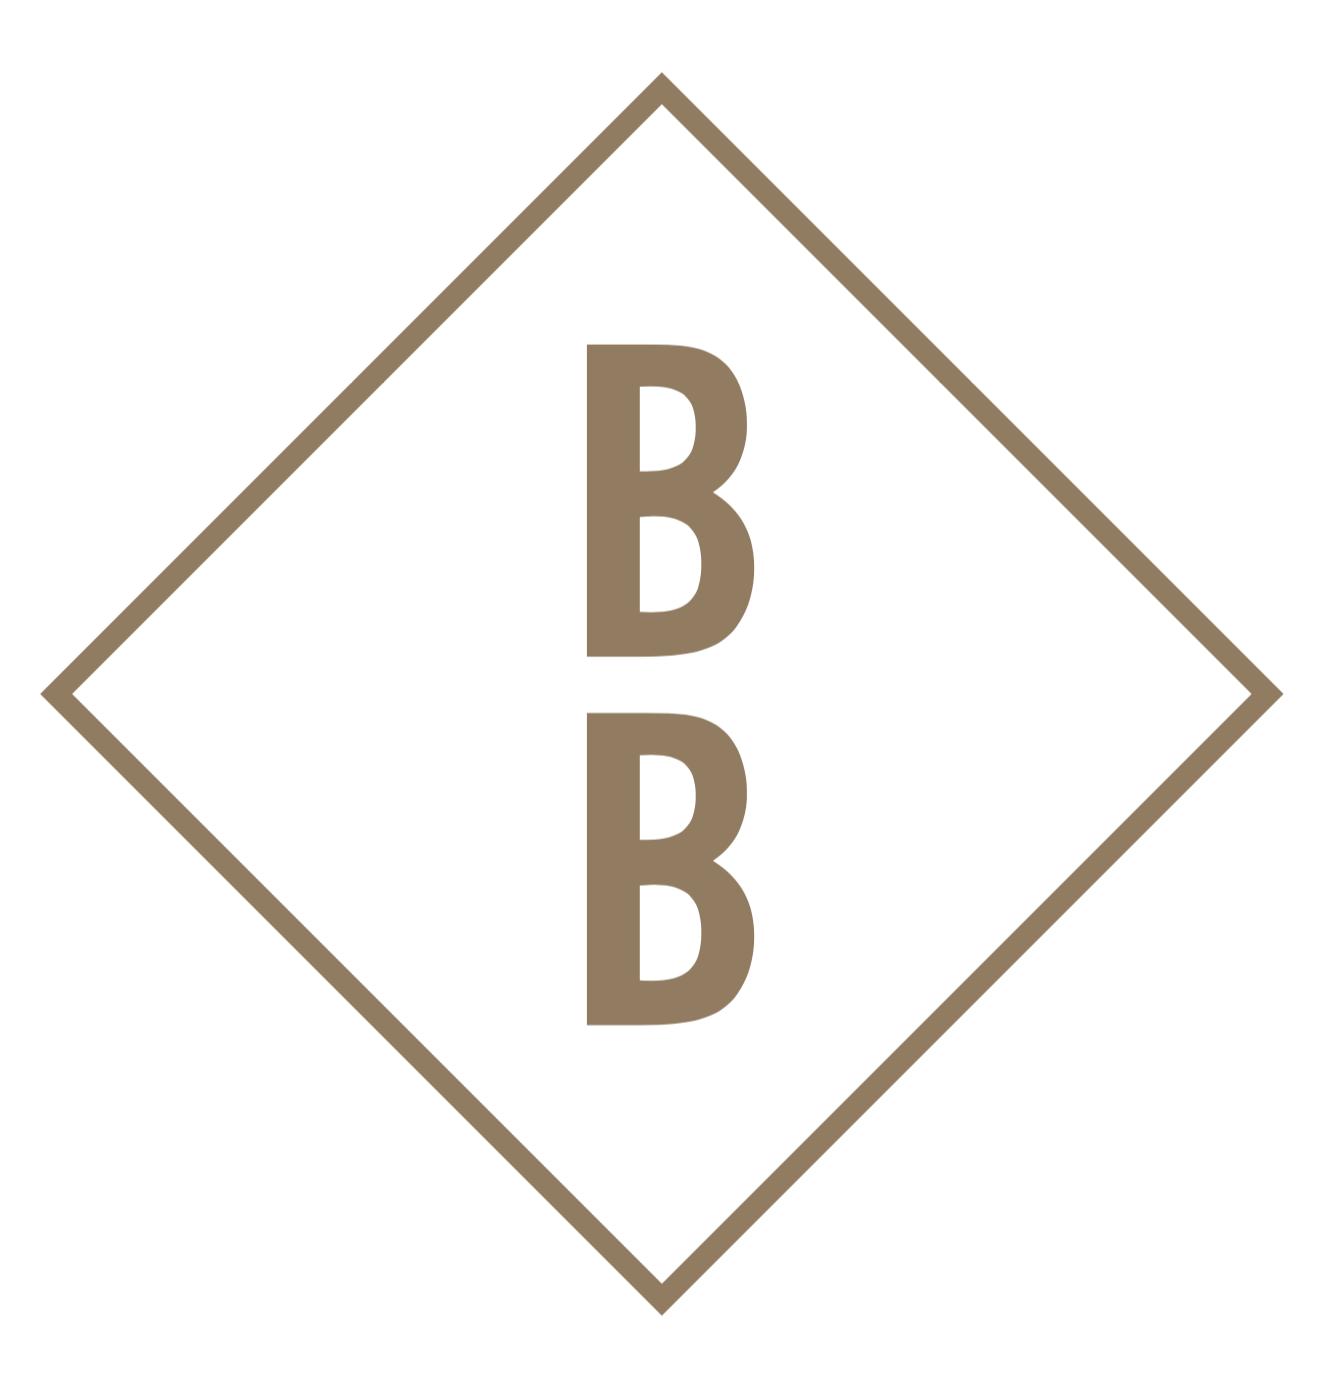 BB_Diamond.png